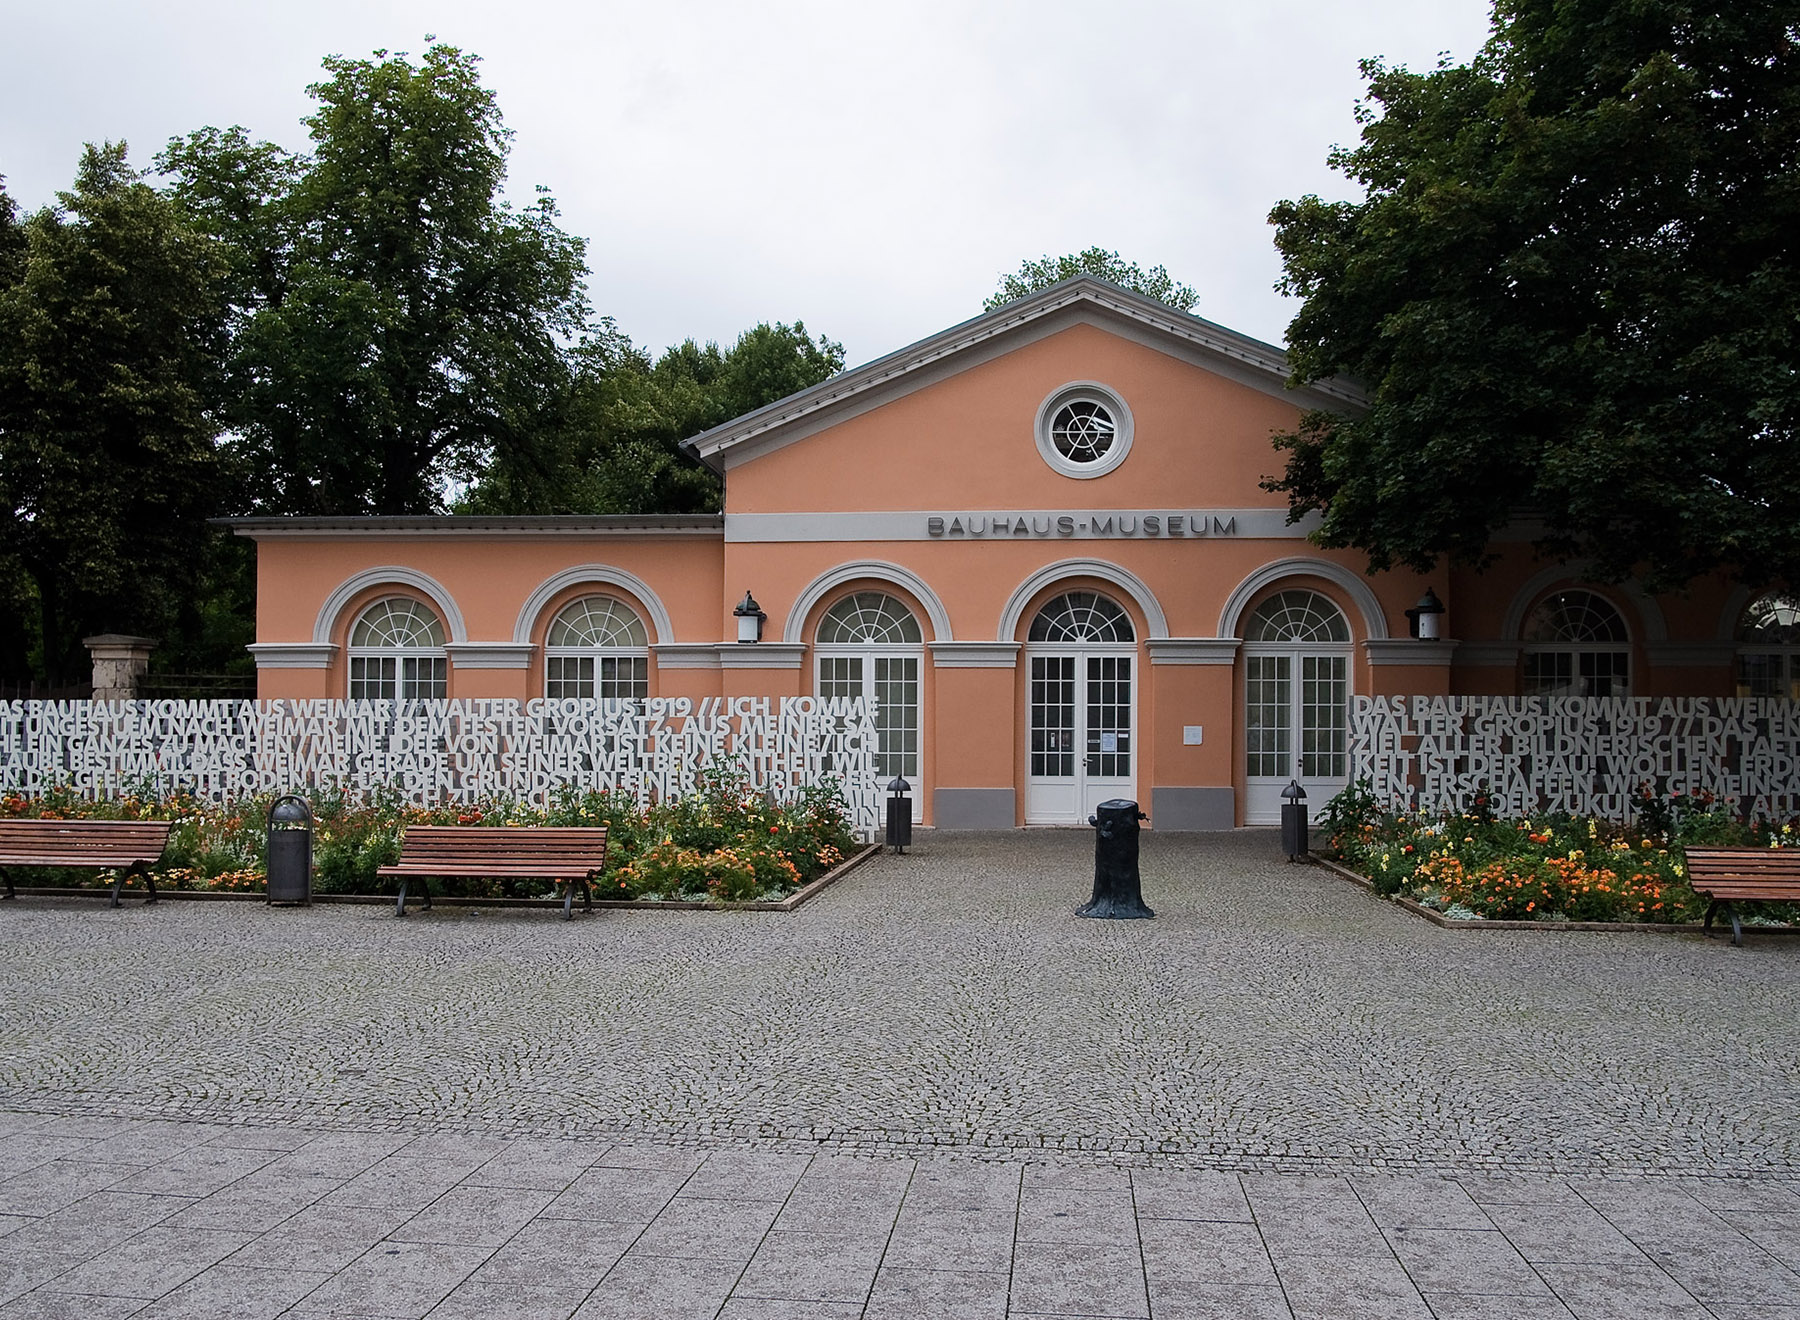 Bauhaus Museum text hedges, photo: Veit Landwehr